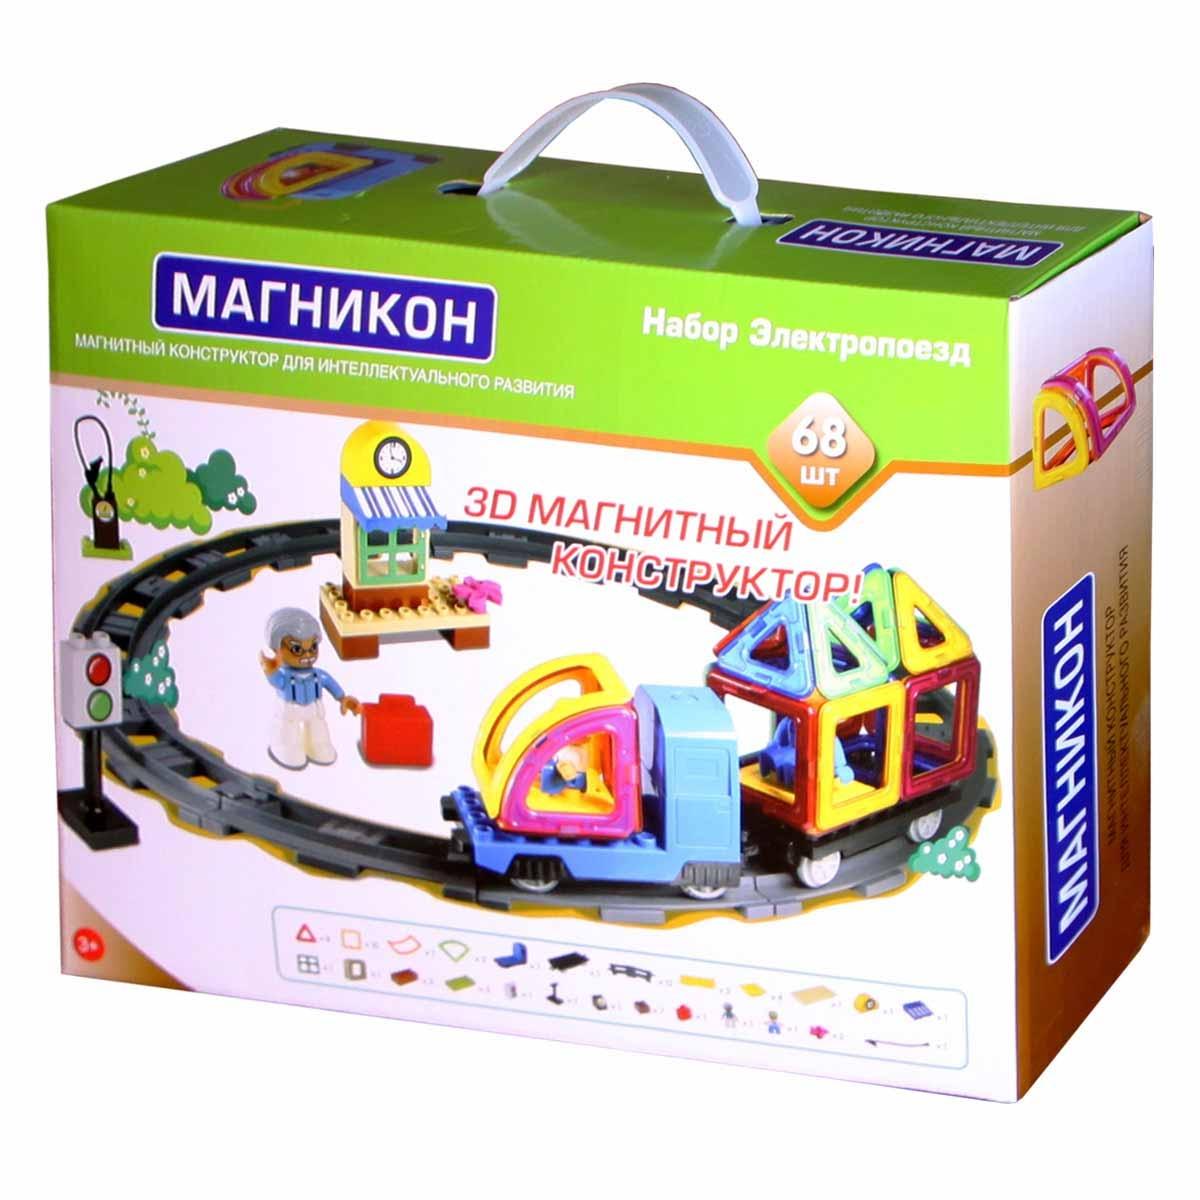 MK-68 Электропоезд